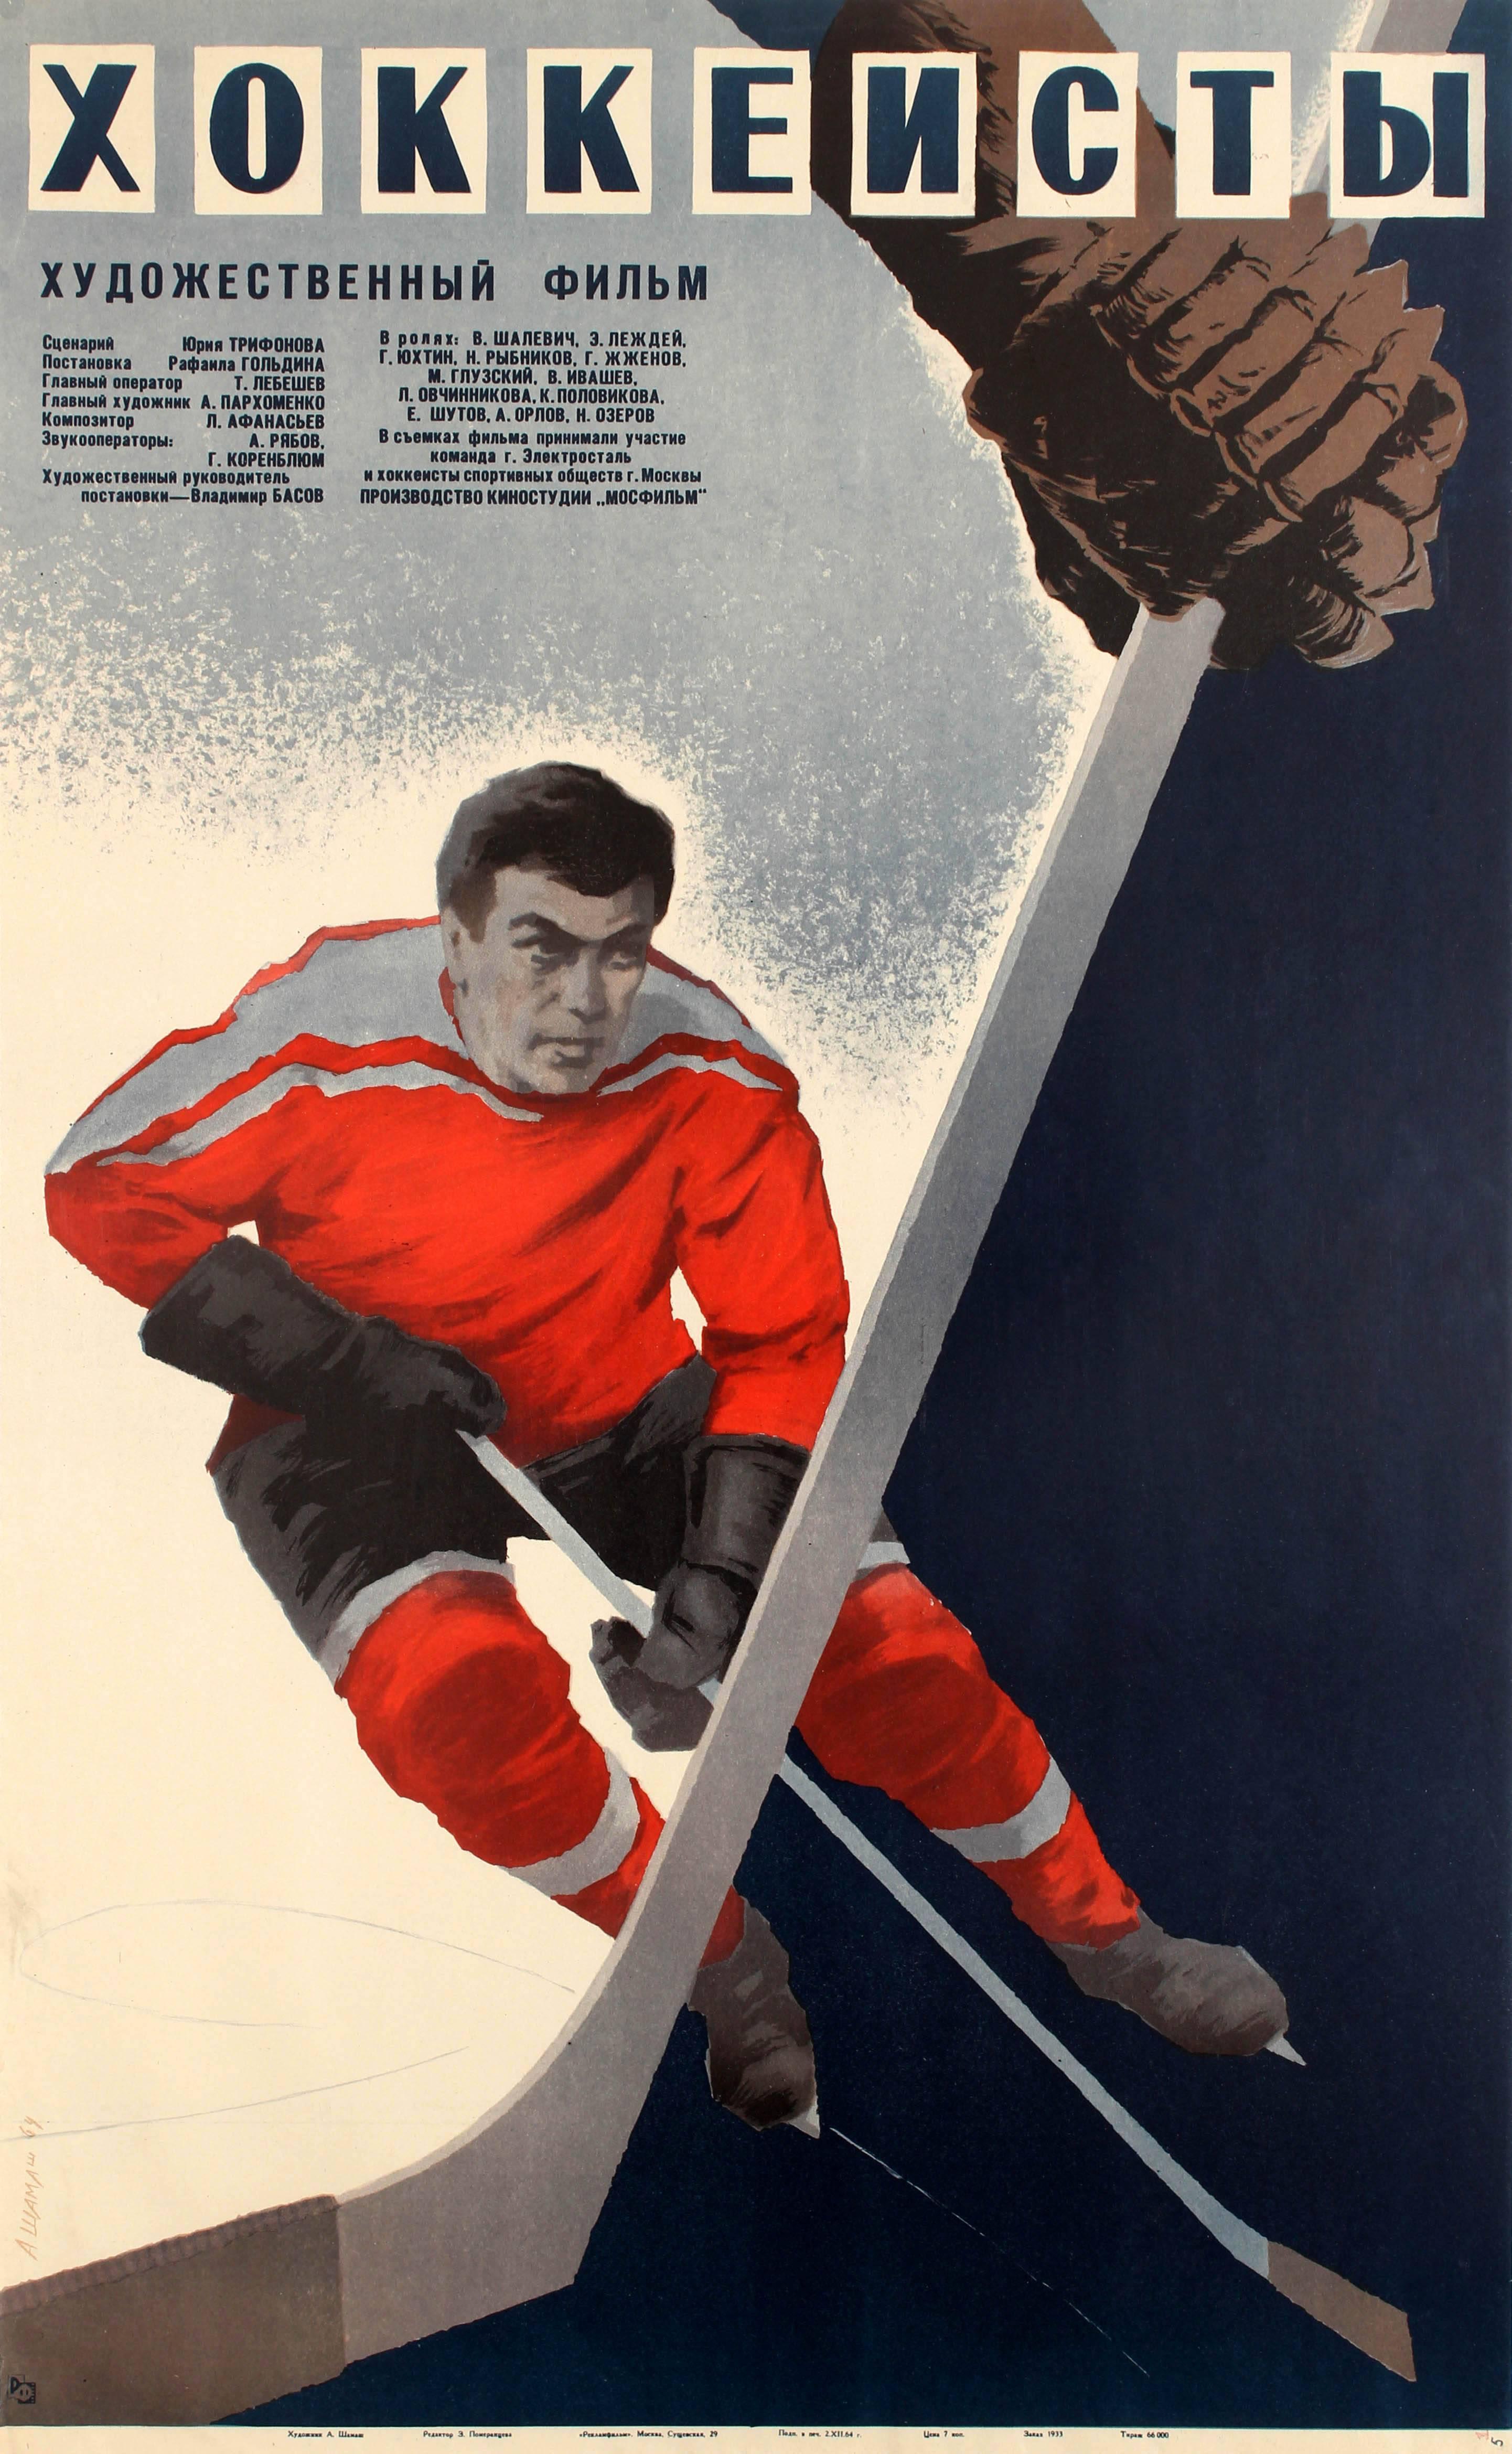 Original Vintage Soviet Movie Poster For A Sport Drama Film - The Hockey Players